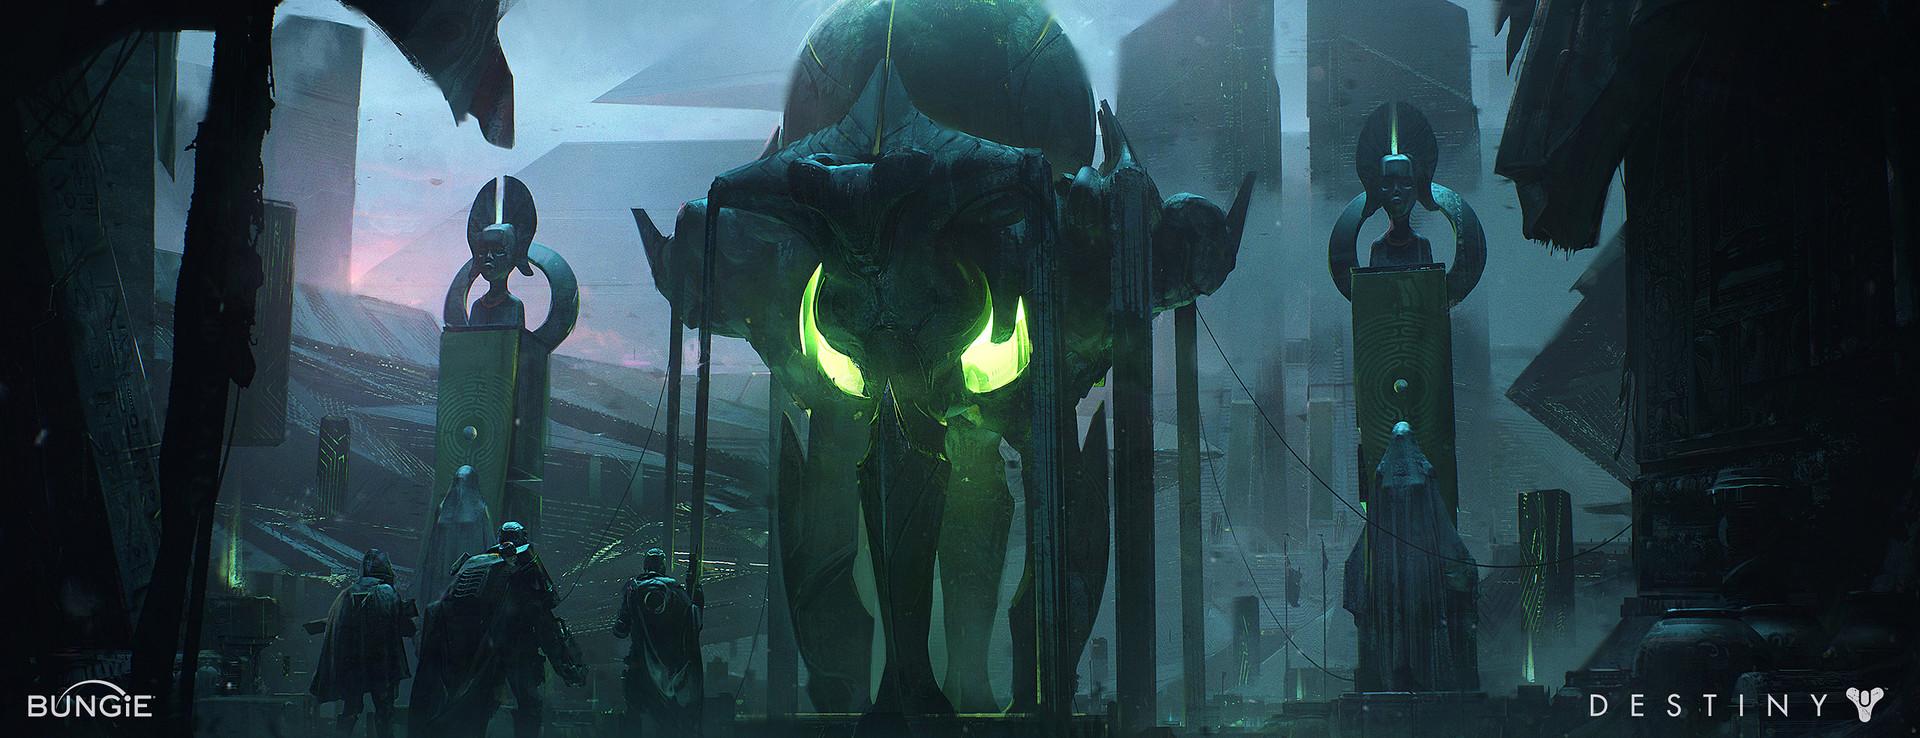 pre released concept art for destiny 2 might reveal future content